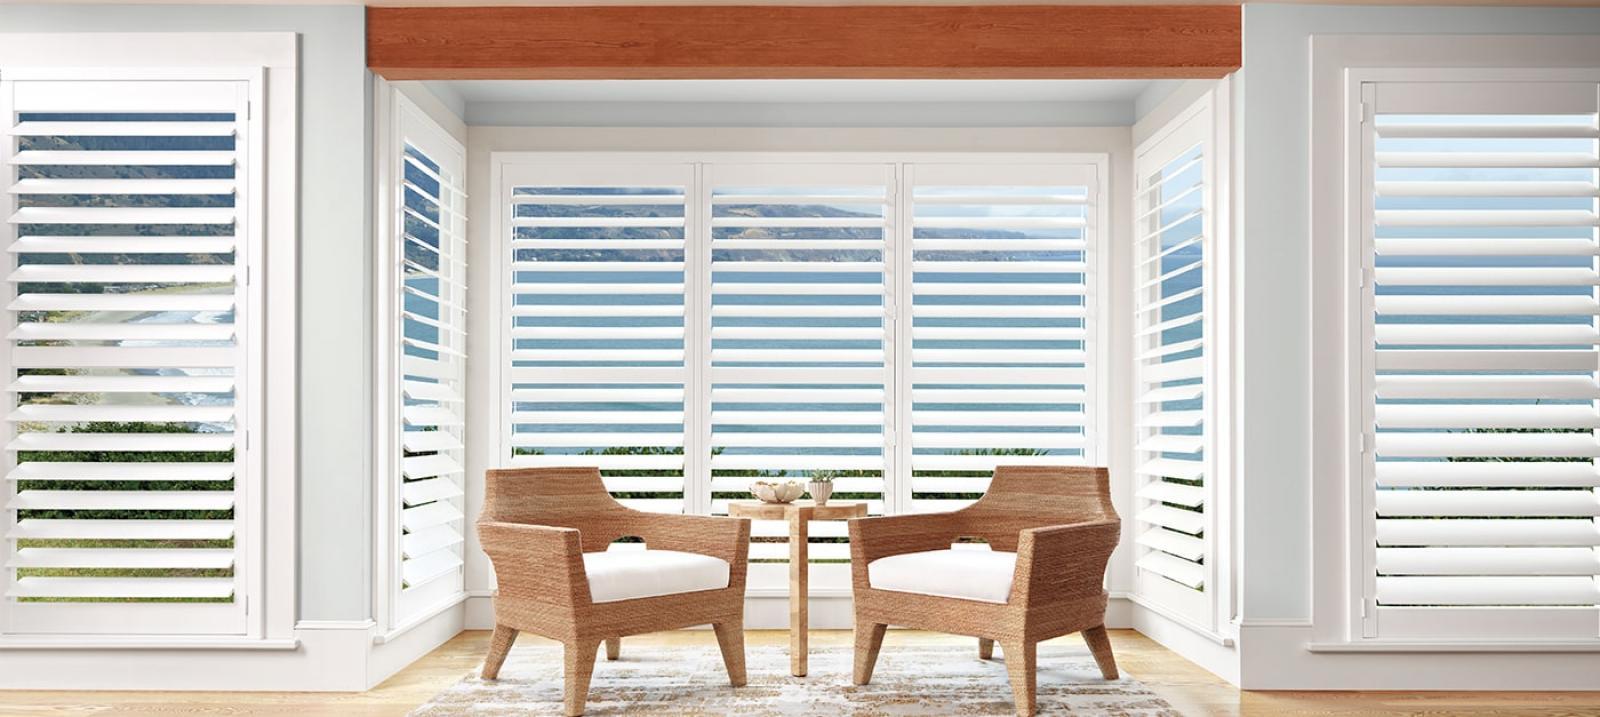 palm-beach-in-bright-white-livingroom